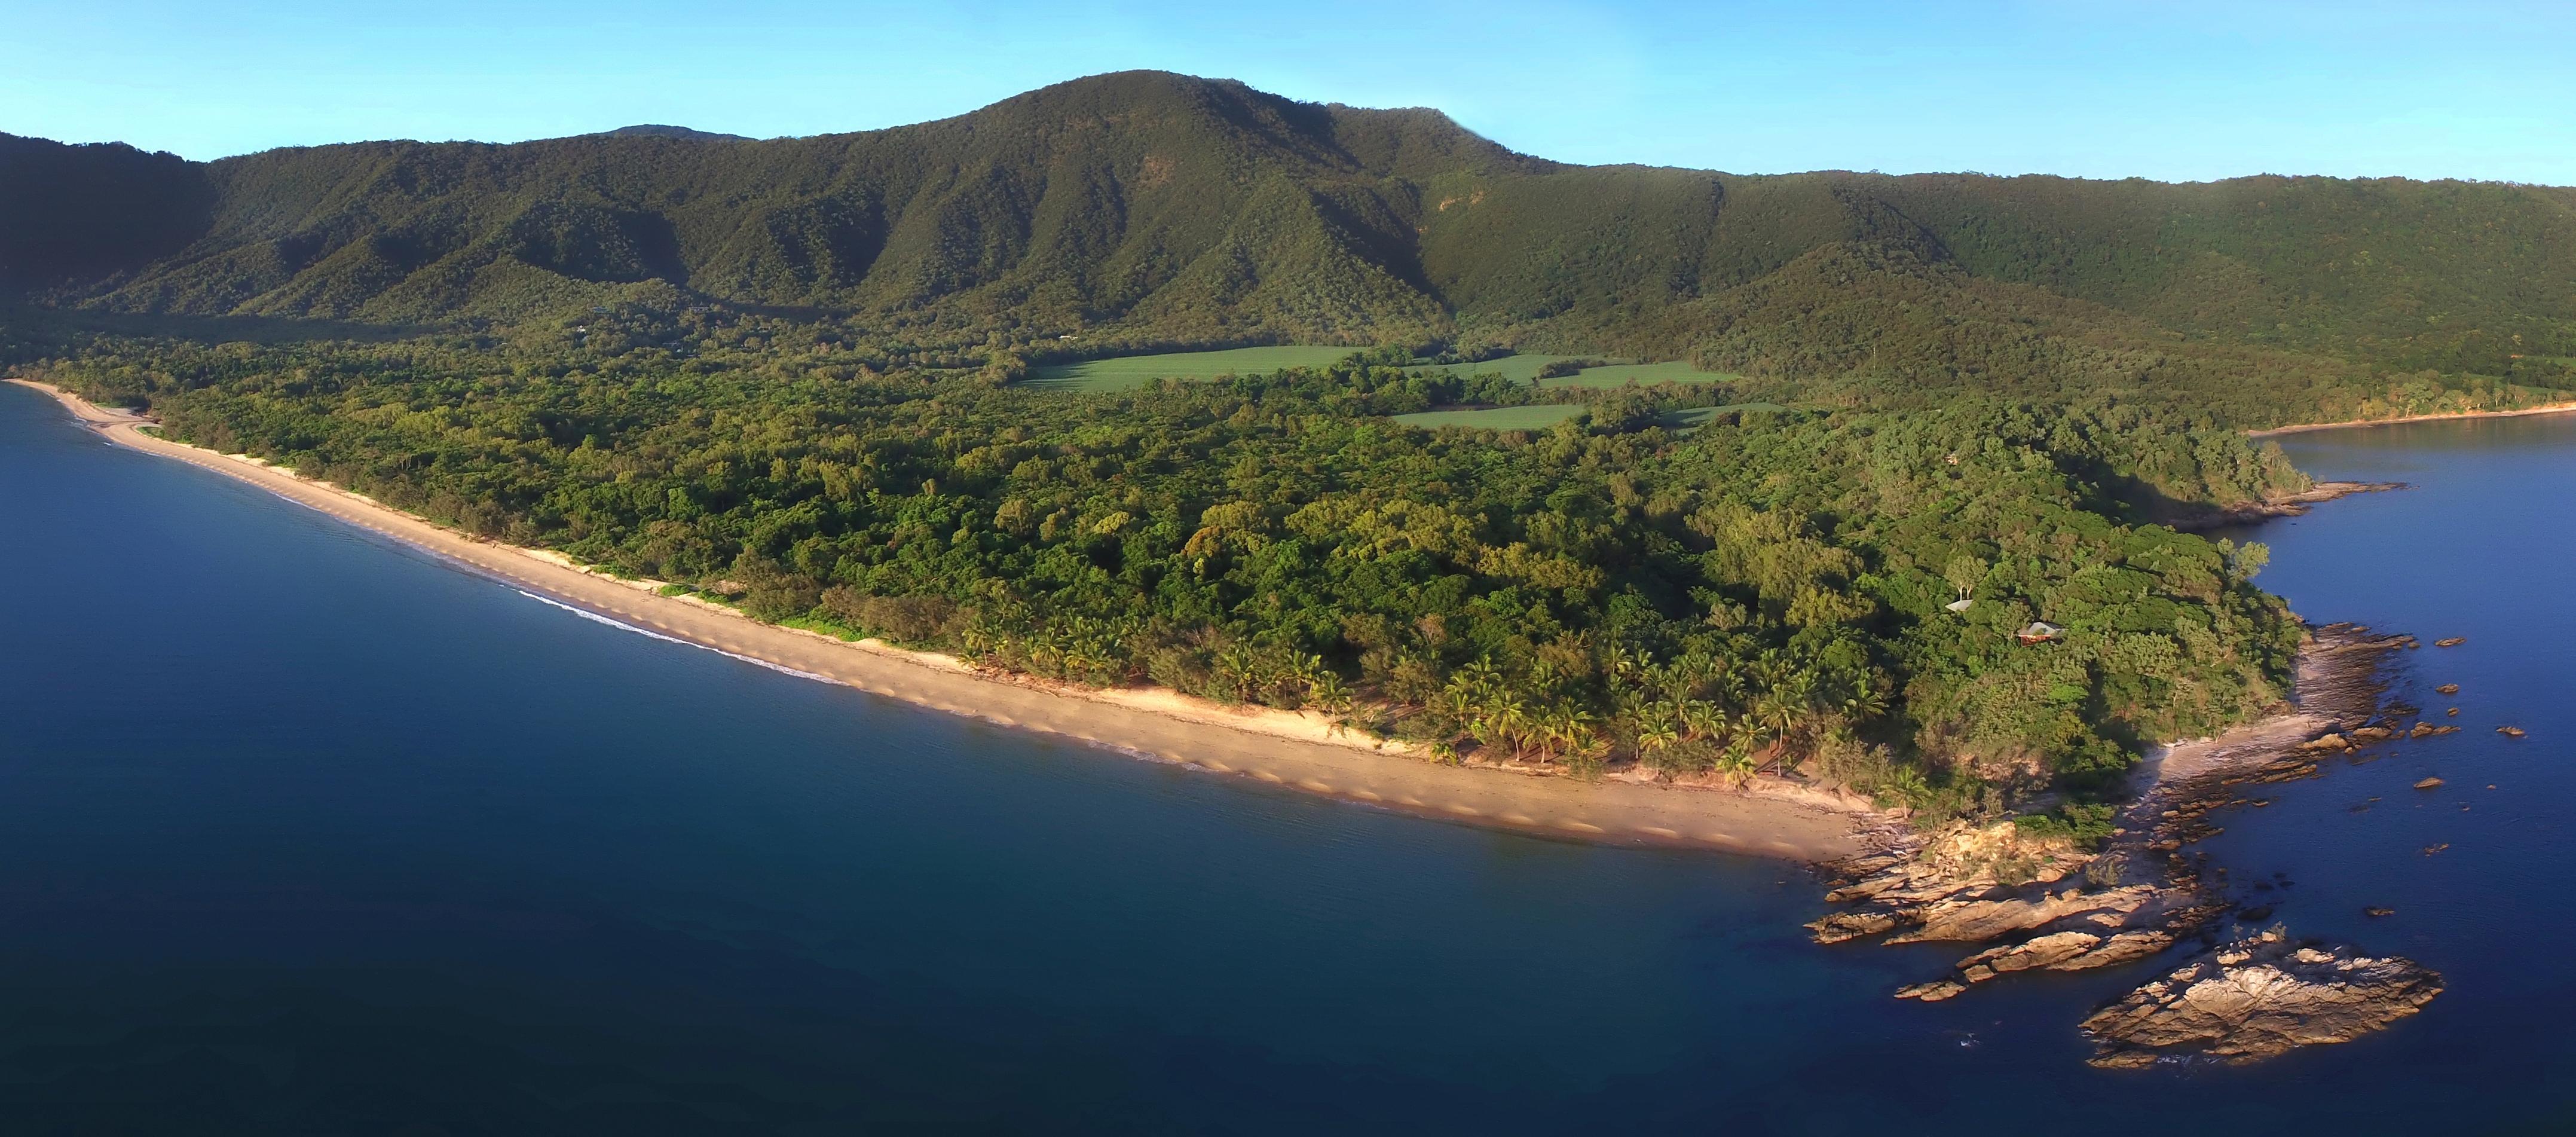 https://www.thalabeach.com.au/wp-content/uploads/2010/07/Thala_Beach_Nature_Reserve_2016__150.jpg